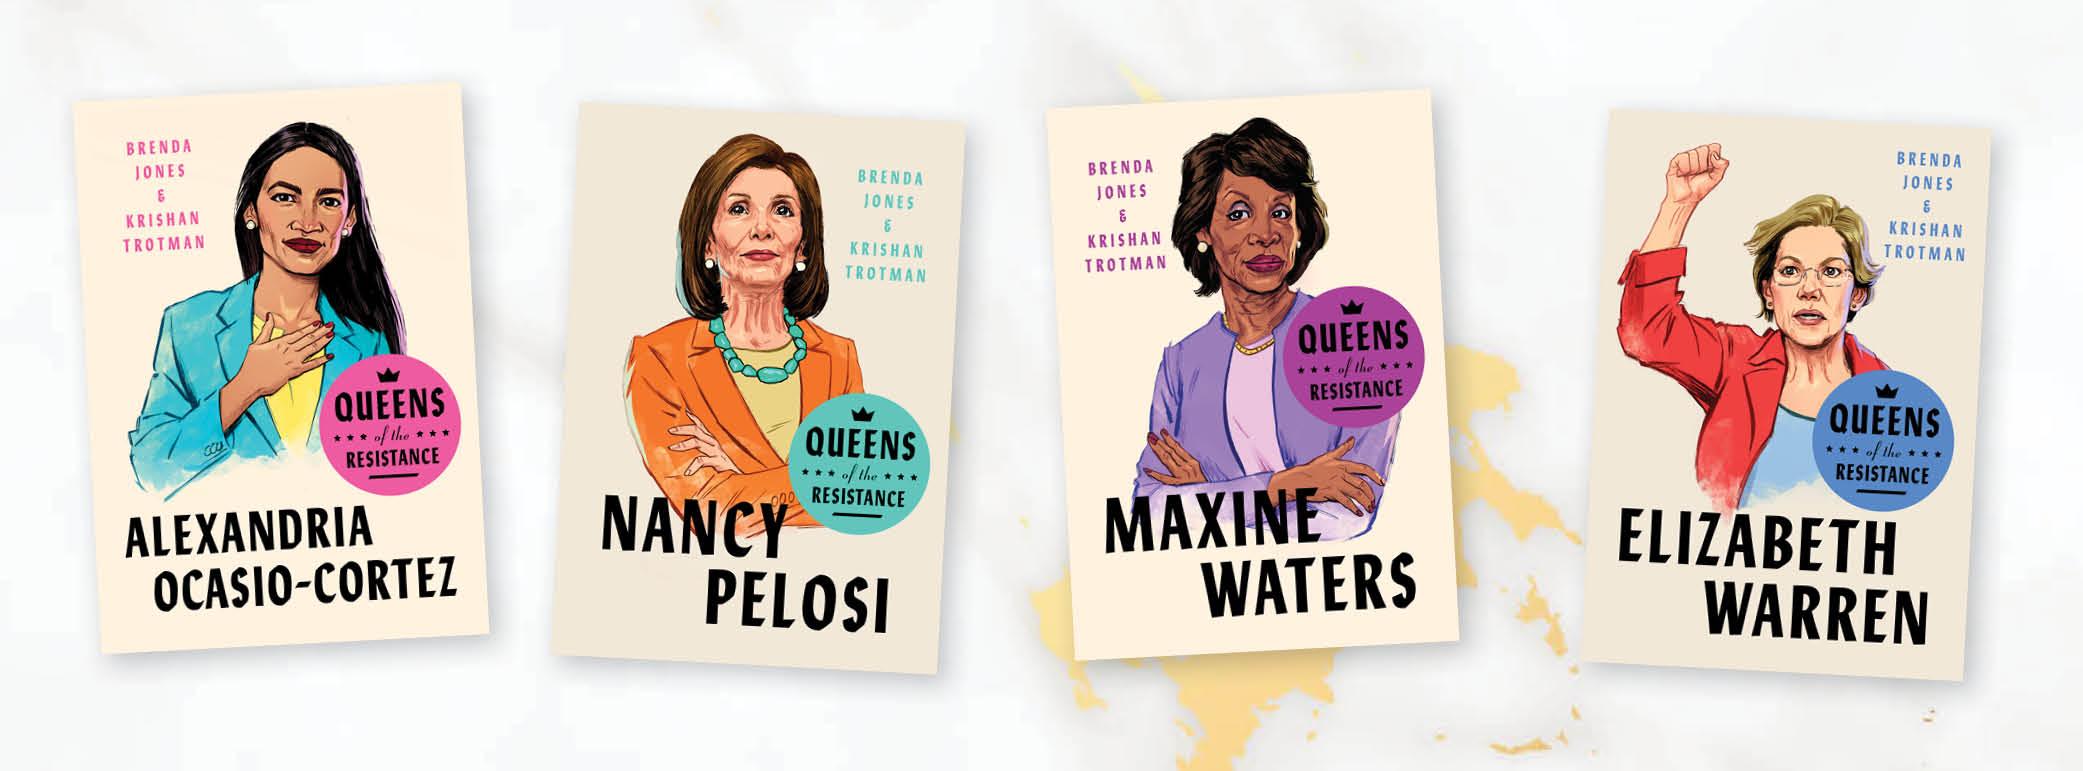 Queens of the Resistance